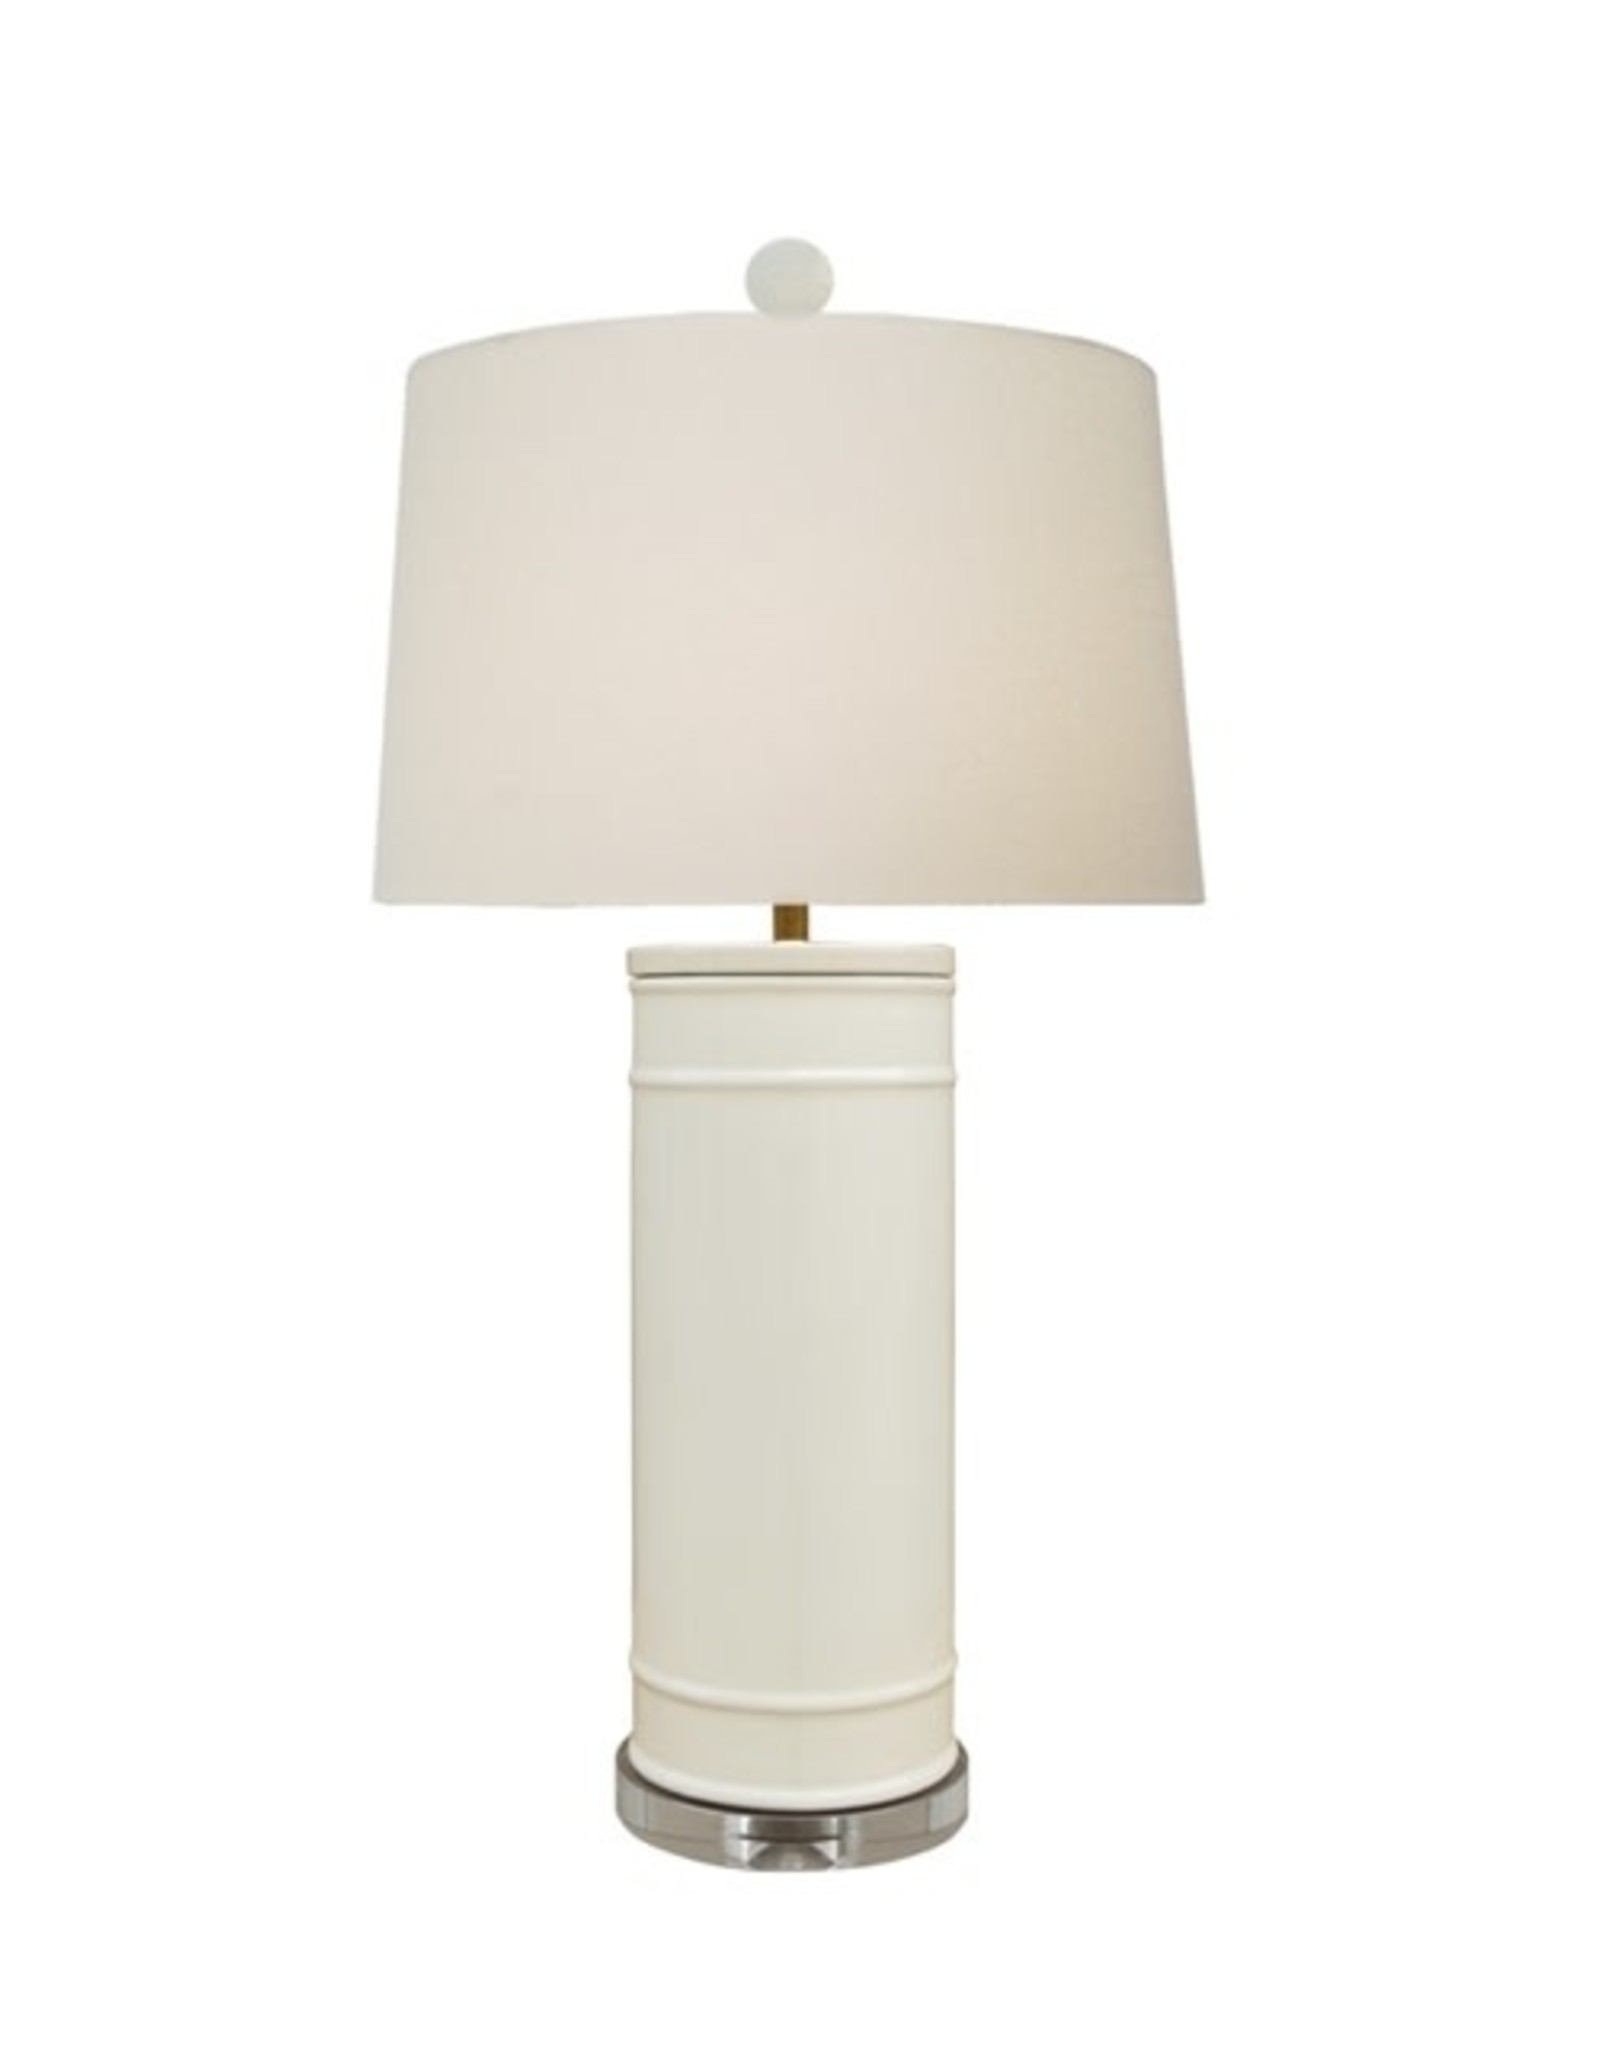 Oak + Arrow Interiors Porcelain Dove White Vase Lamp